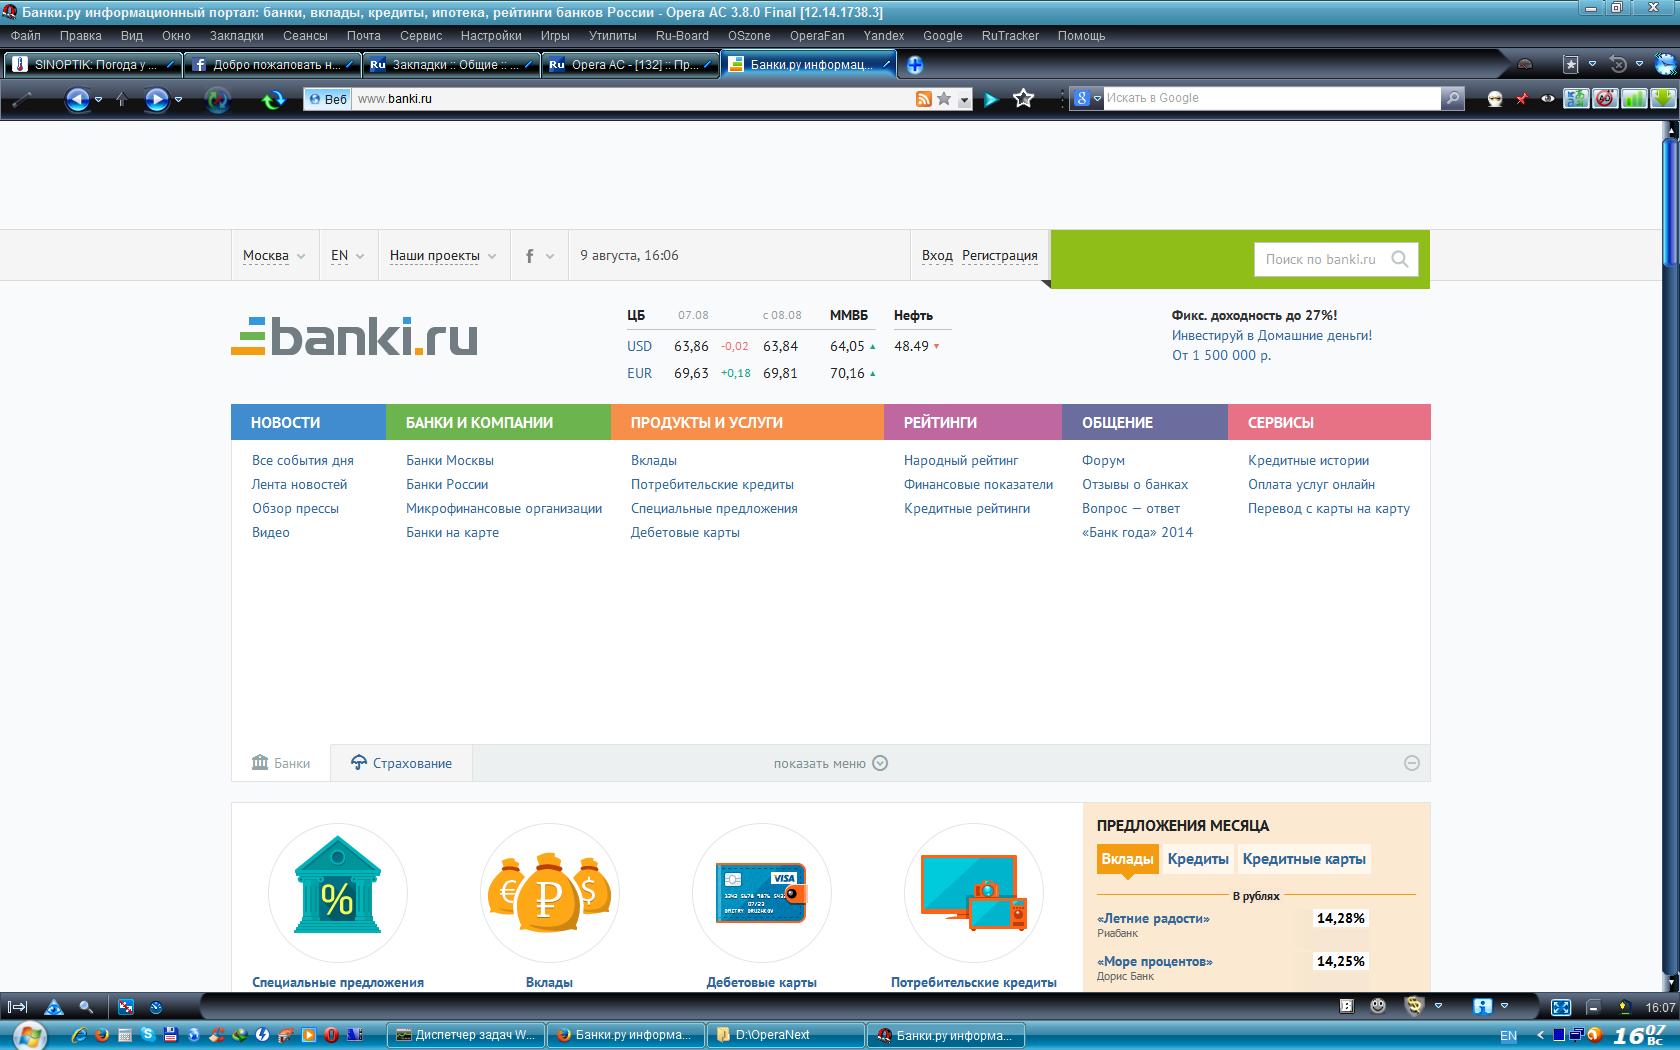 banki.ru.PNG